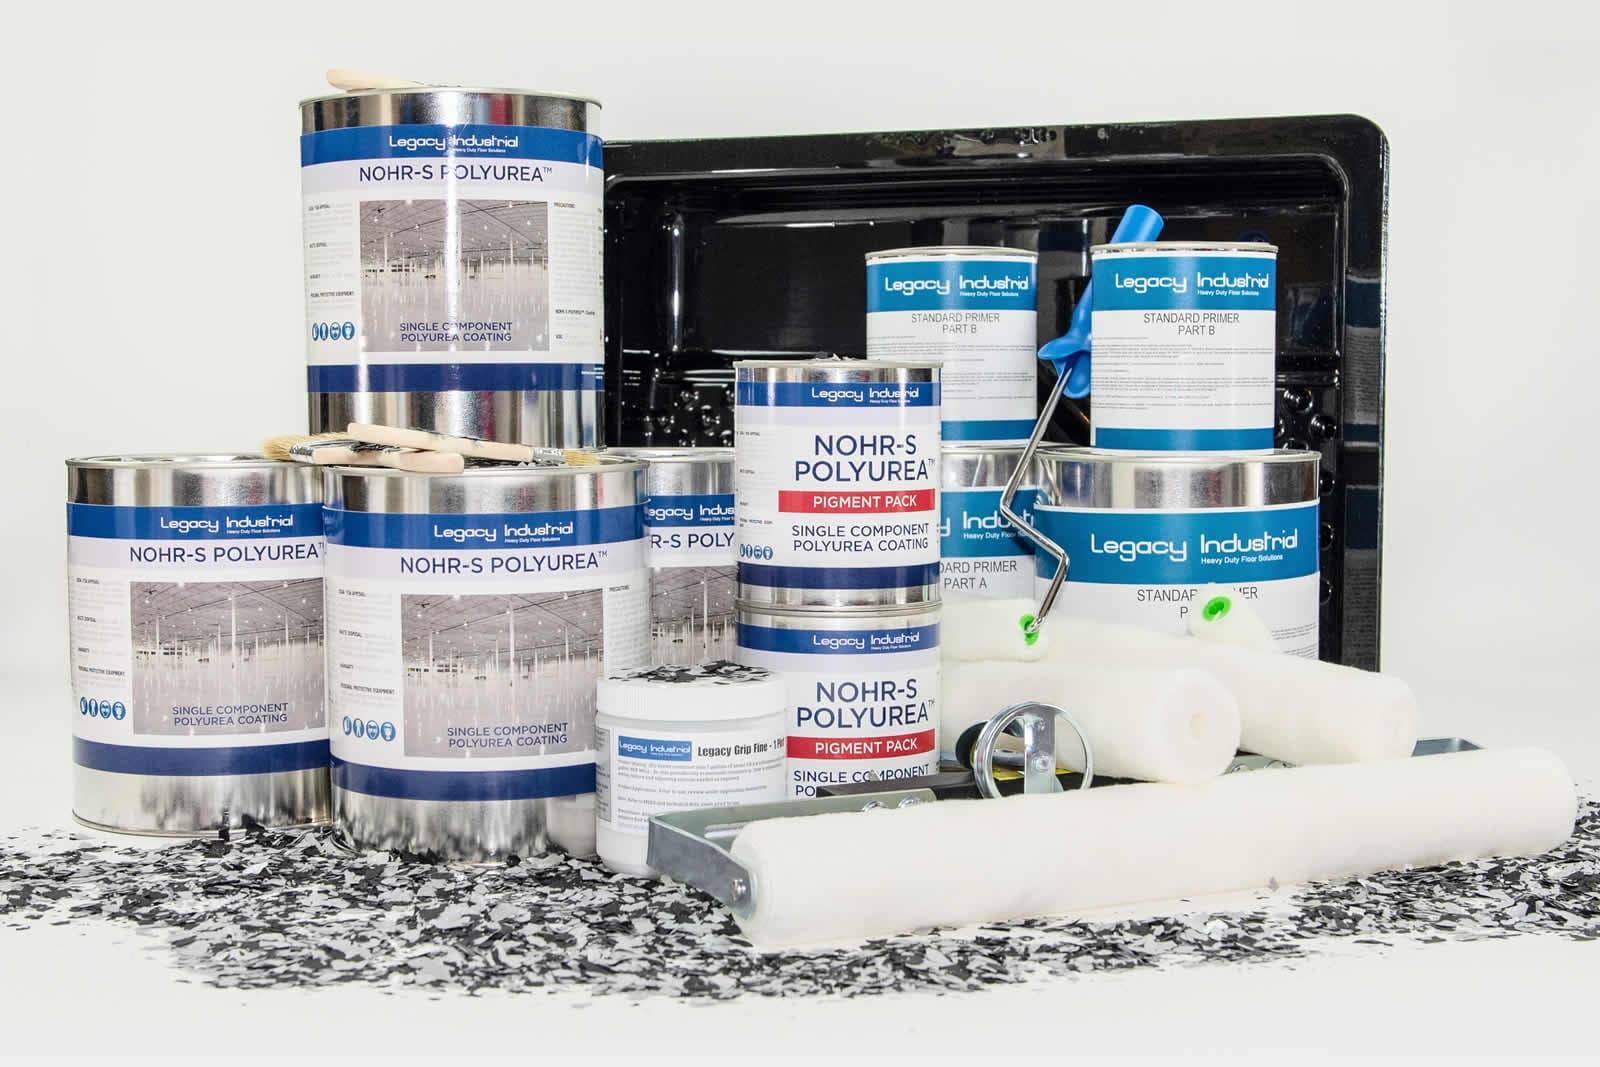 nohr-s-polyurea-concrete-coating-garage-kit-1